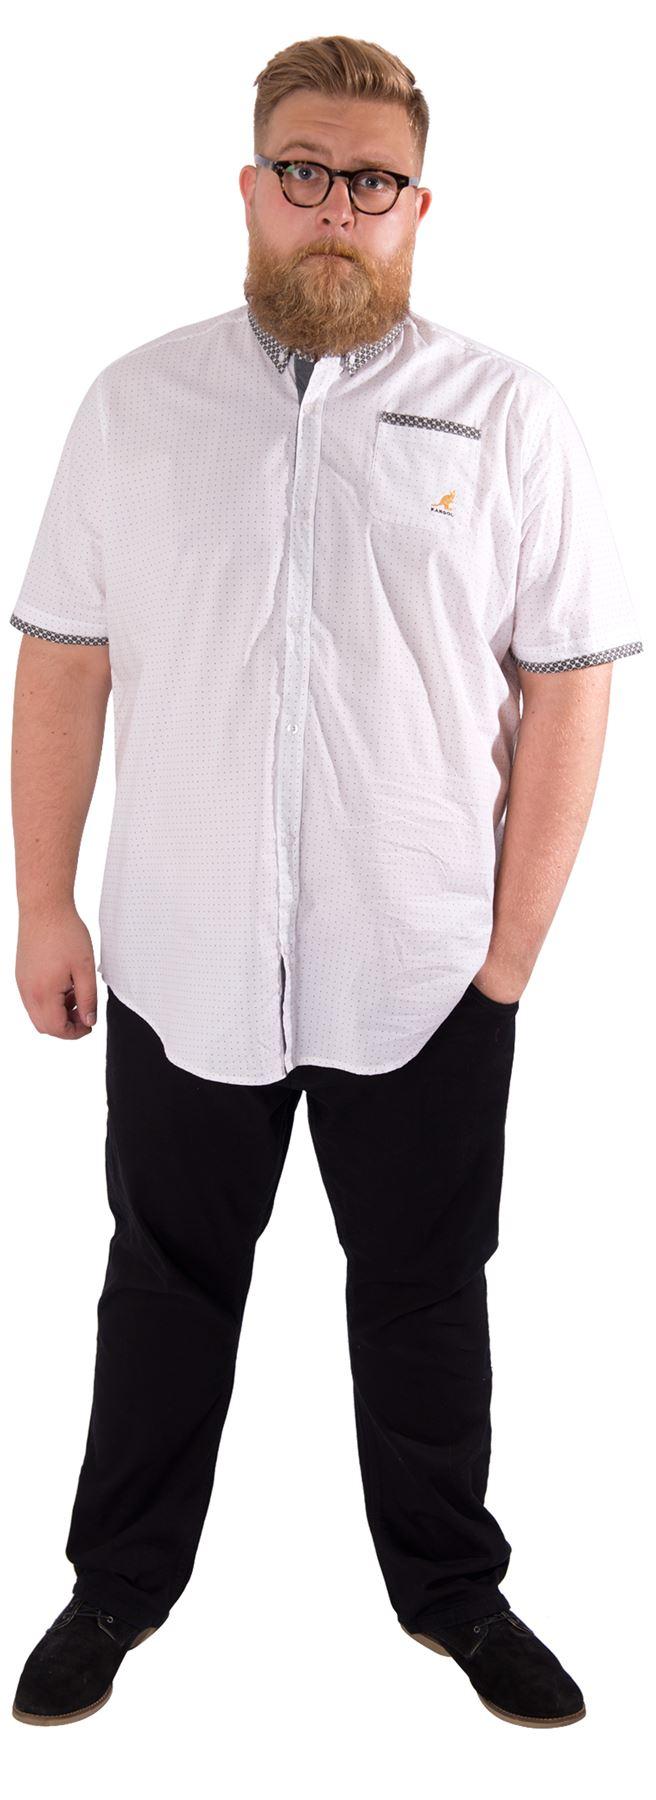 Kangol mens plus size short sleeve shirt button down for Best short sleeve button down shirts reddit